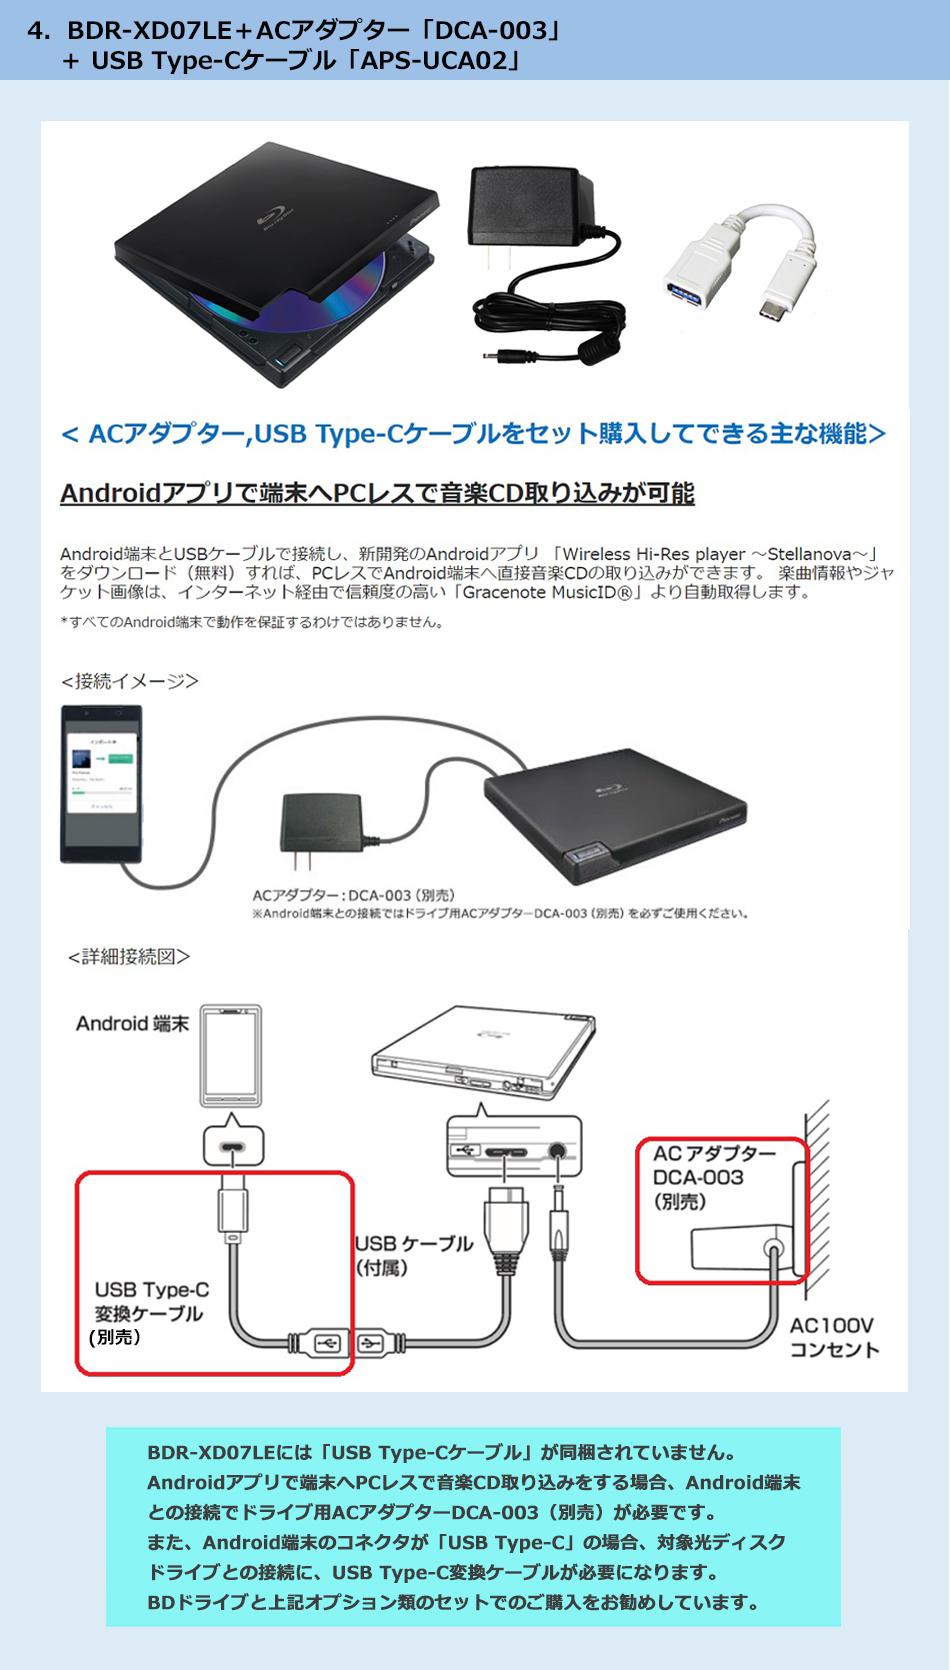 4.BDR-XD07LE+ACアダプター「DCA-003」+USB Type-Cケーブル「APS-UCA02」セットのご紹介